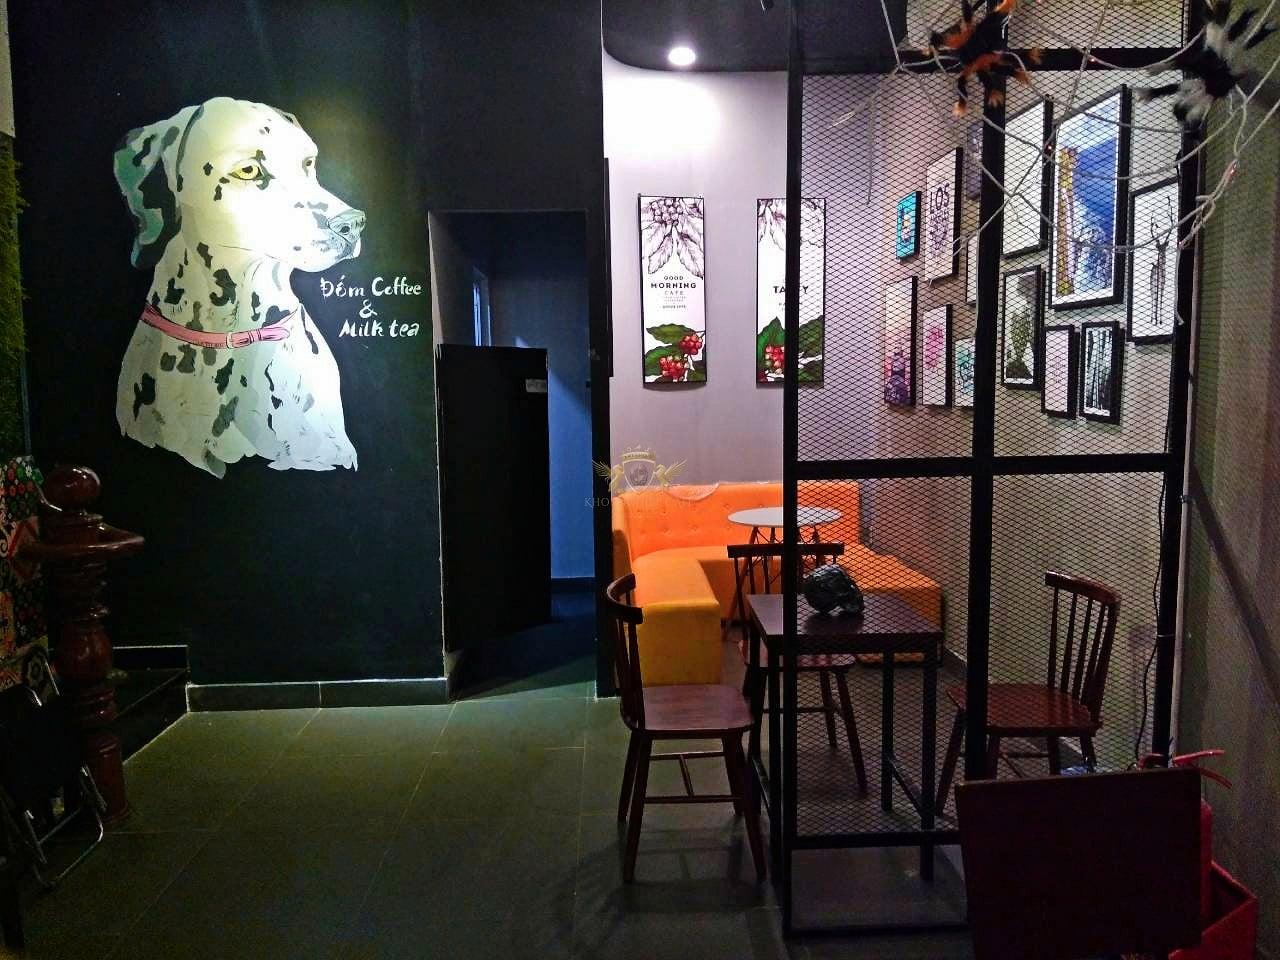 Dom Cafe Go Vap mua ban may pha cafe chuyen nghiep cua y Faema E98 RE A2 HC600 khoi nghiep cafe 13